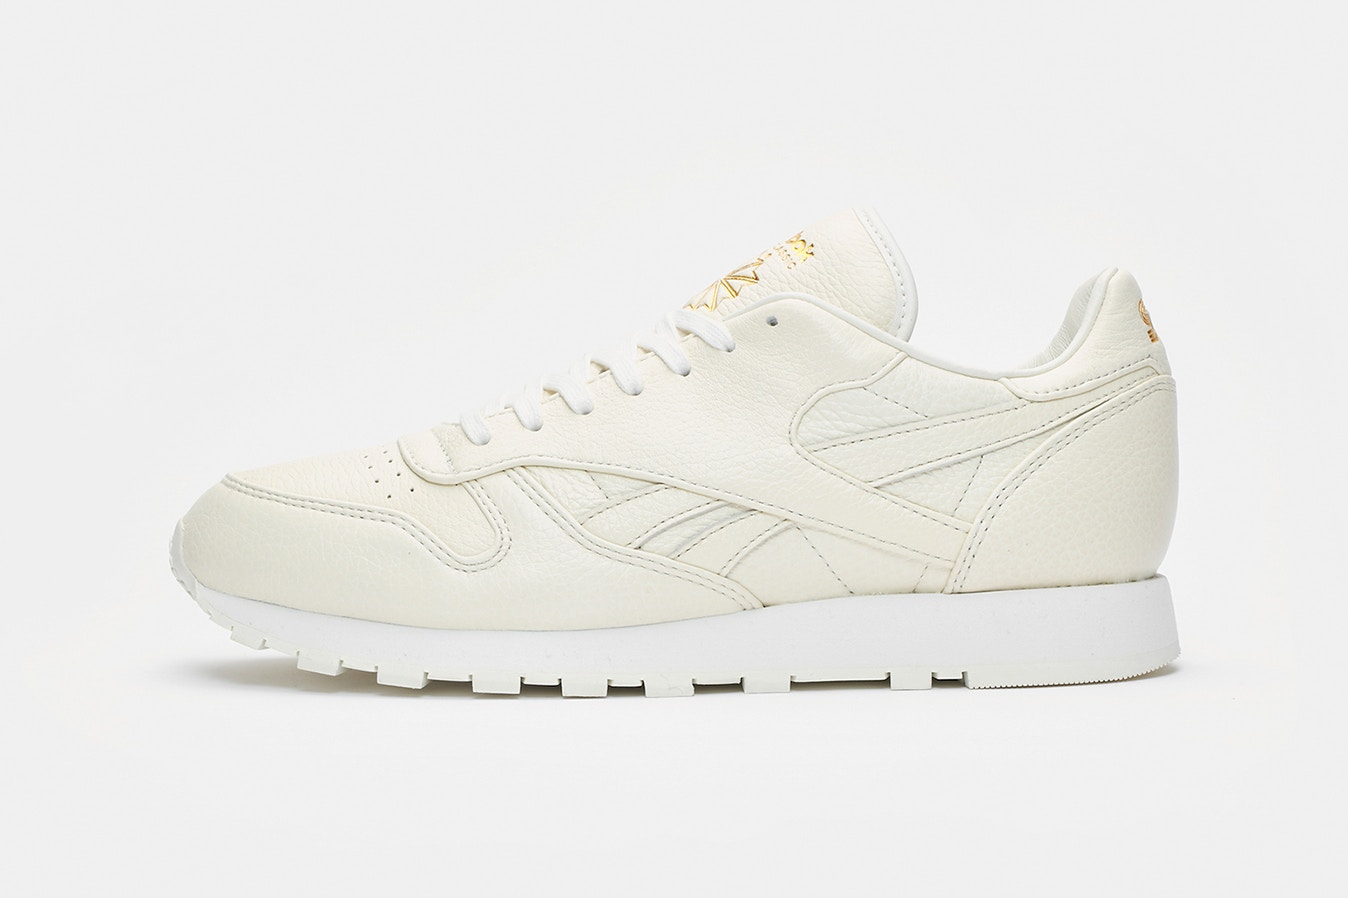 d57e01c7b Sneakersnstuff x Reebok Classic Leather